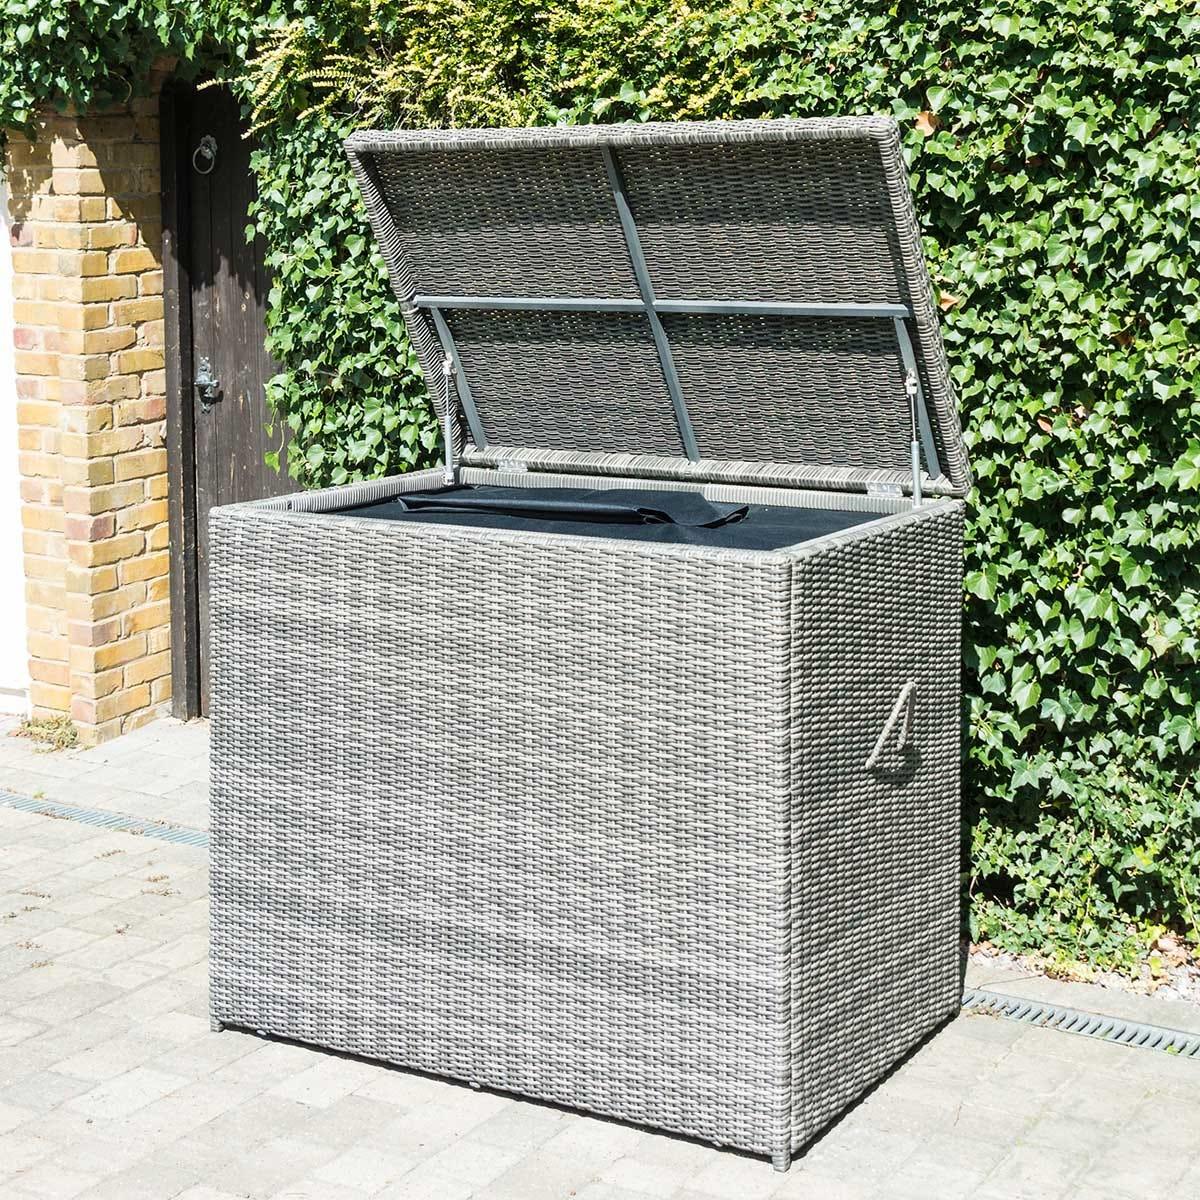 Glencrest Katie Blake Seville Large Waterproof Cushion Storage Box - Grey